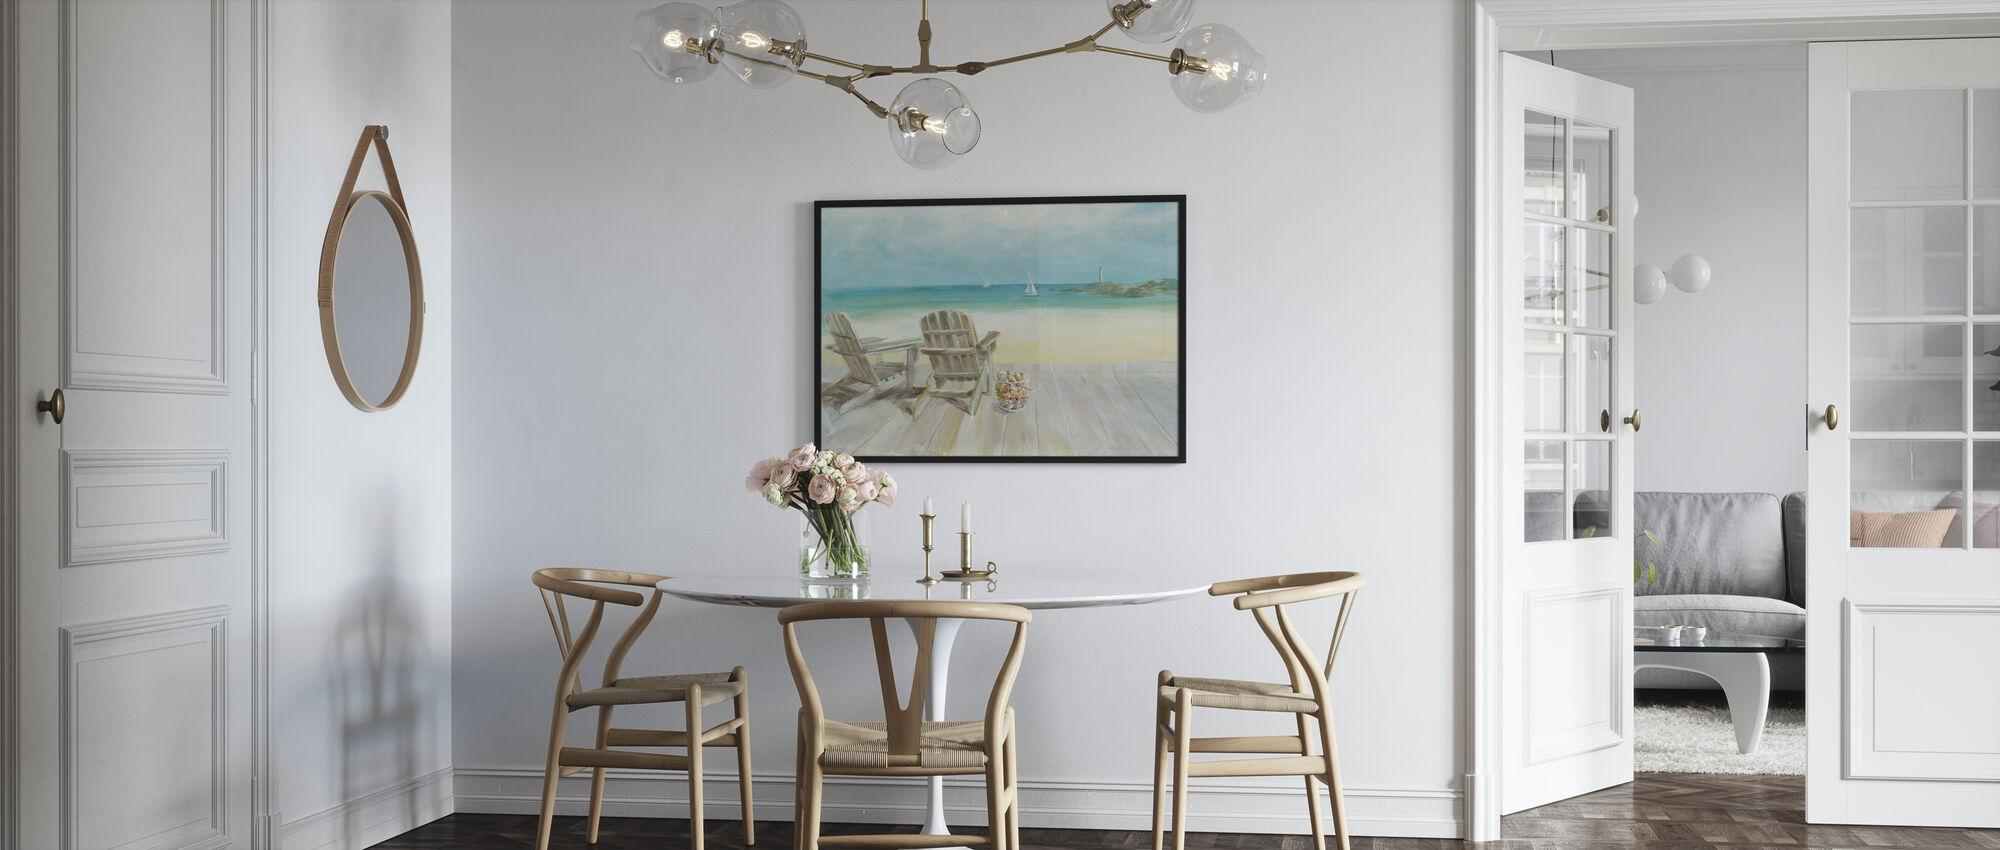 Ocean View - Framed print - Kitchen